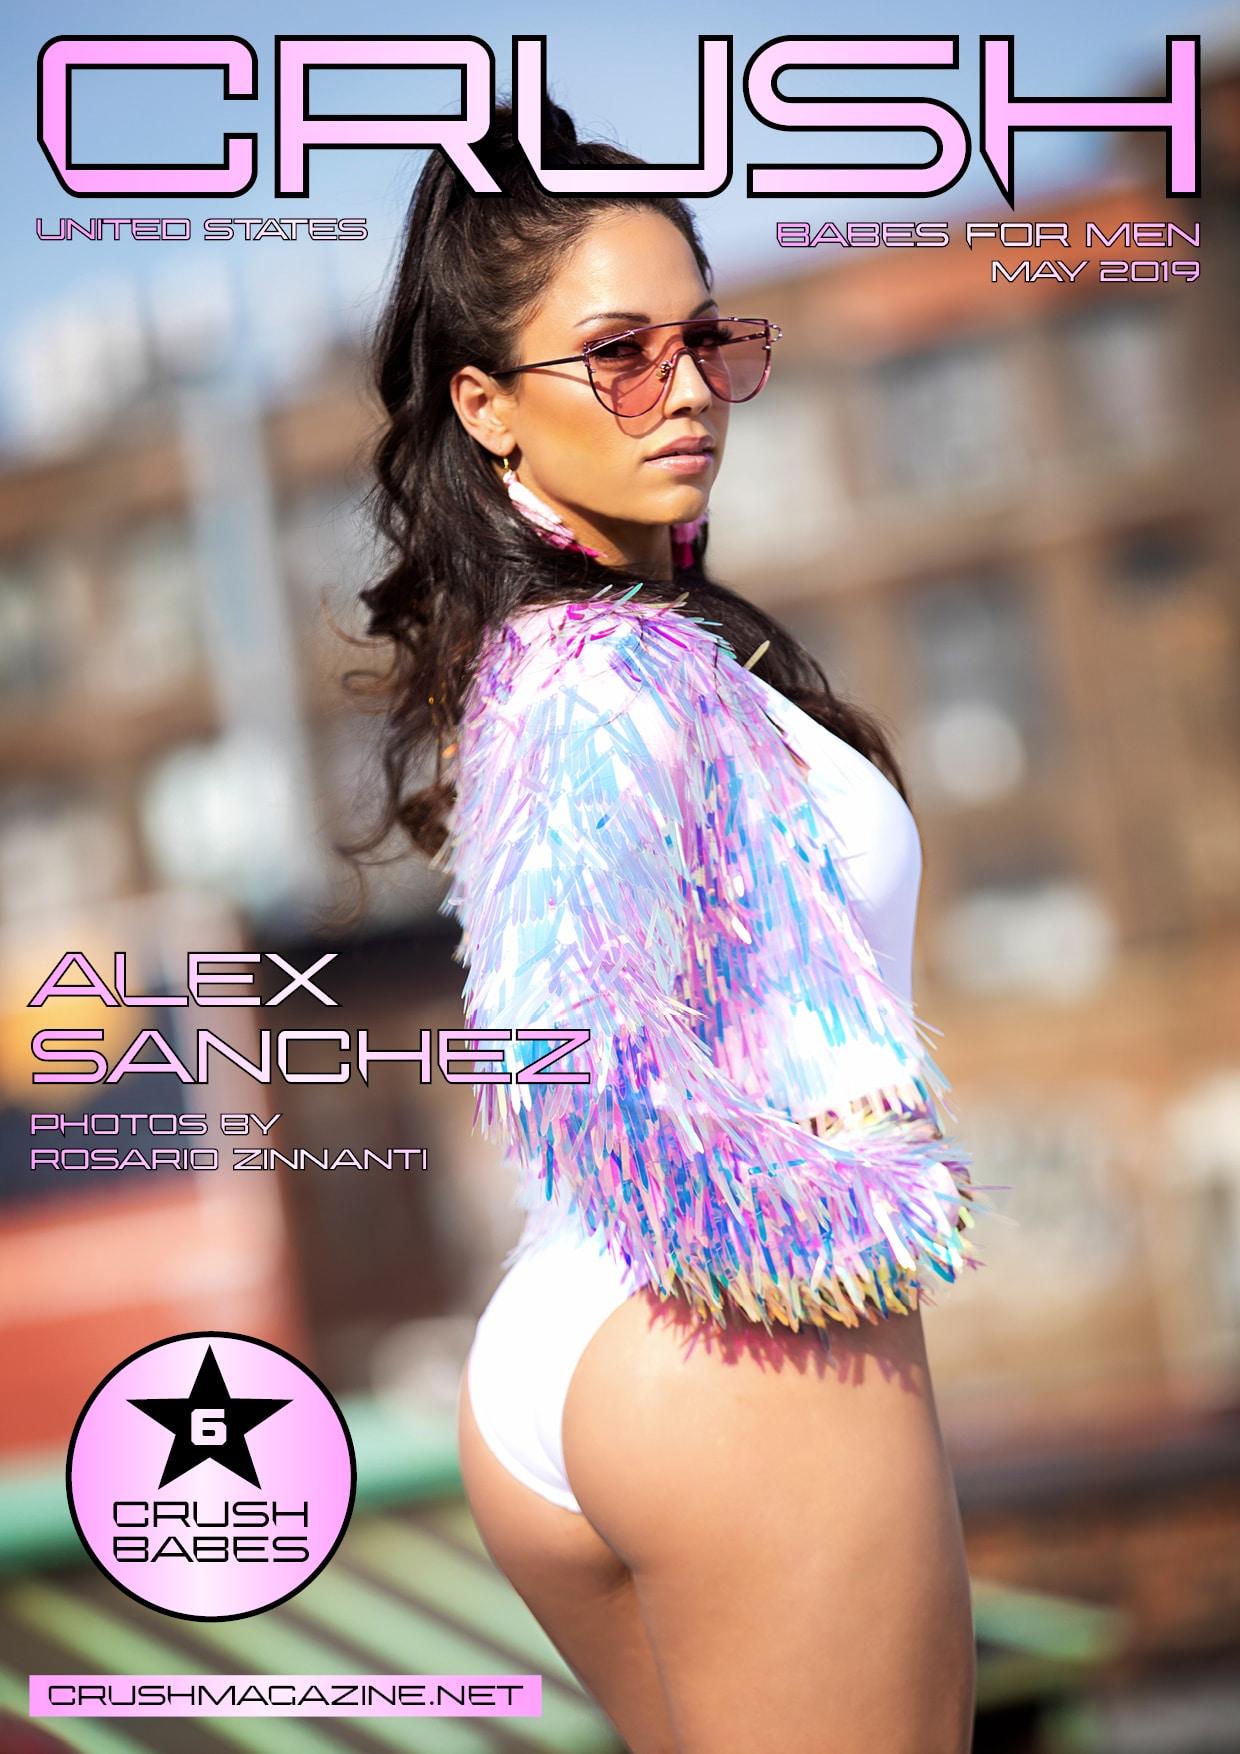 Crush Magazine - May 2019 - Alex Sanchez 1